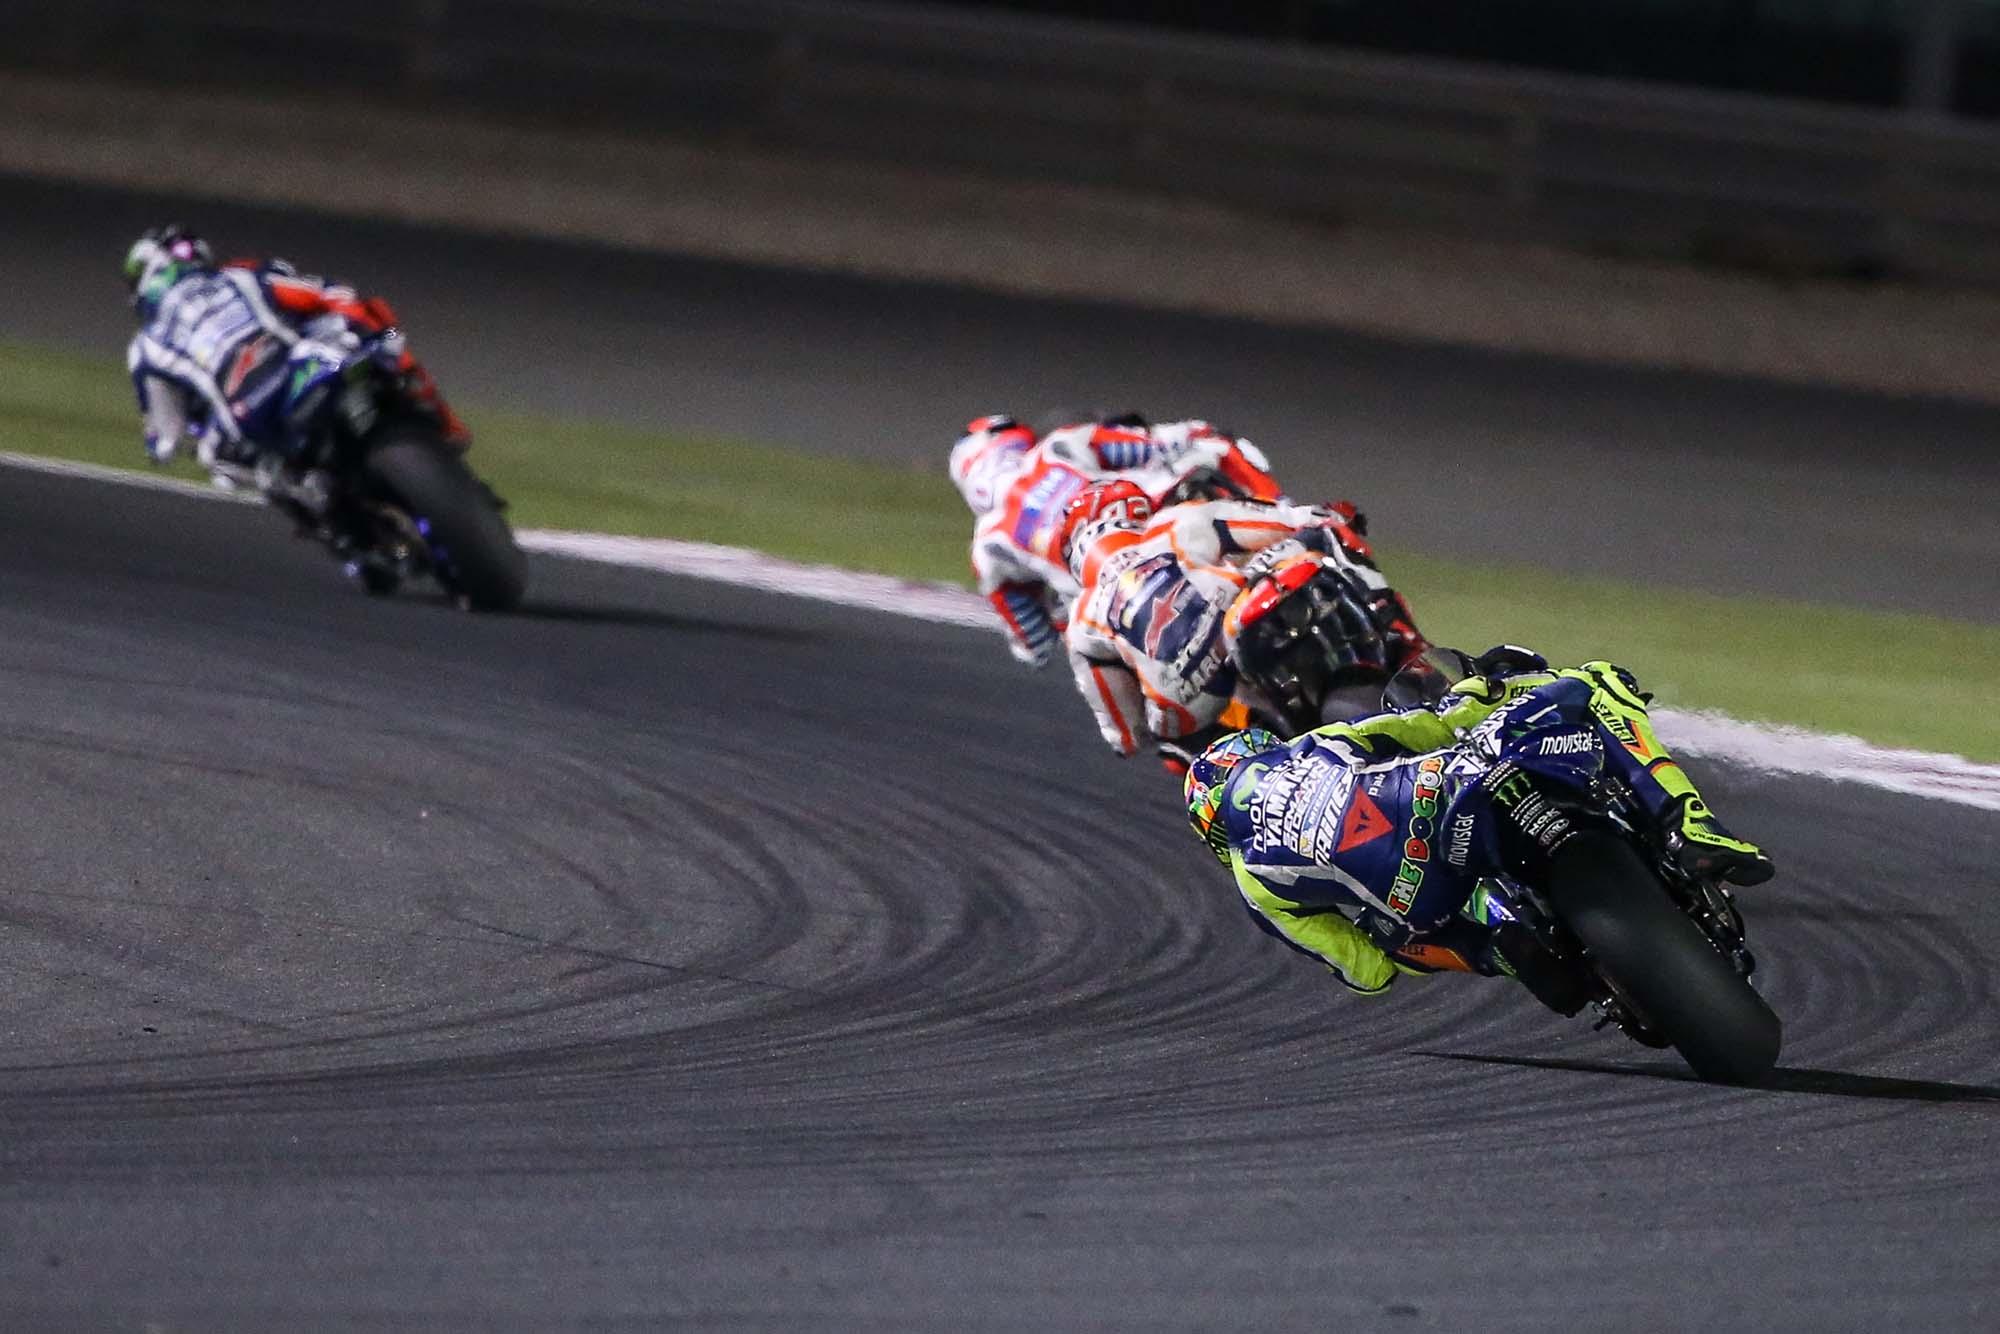 [GP] Qatar - Page 2 MotoGP-Qatar-GP-Sunday-WUP-race-CormacGP-106